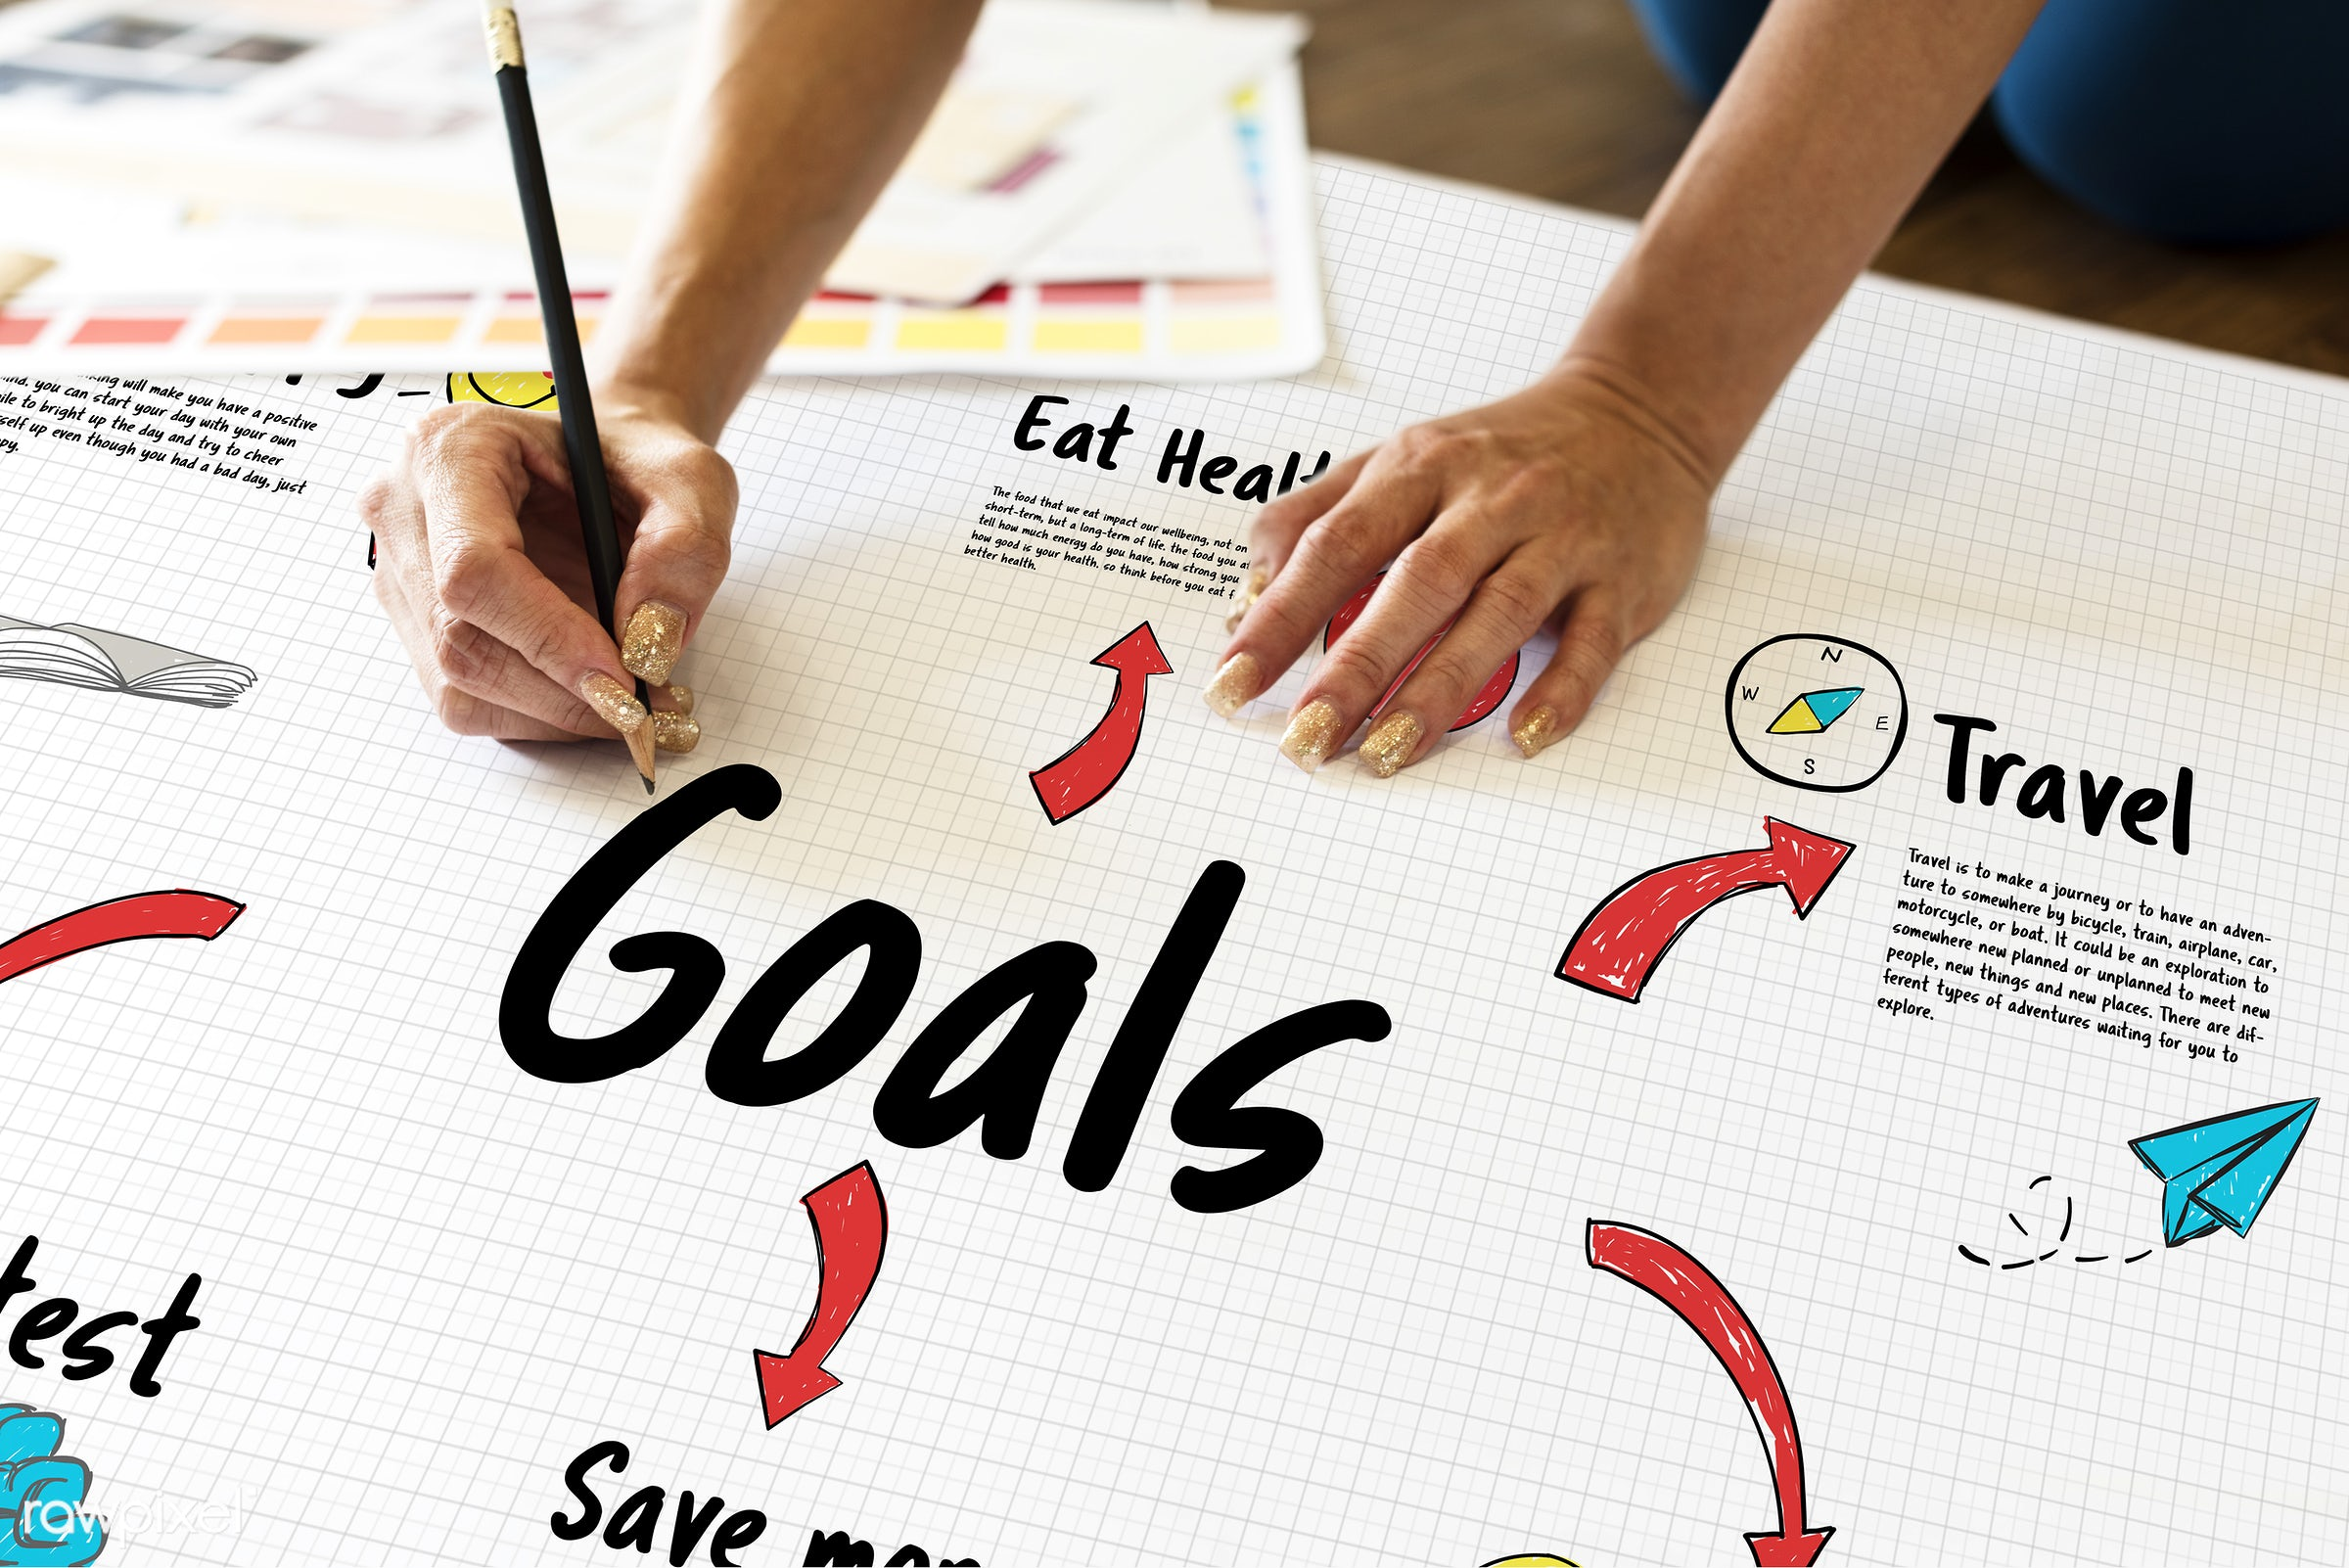 achieve, aim, art, beginning, creation, creative, creativity, design, diagram, drawing, eat, goals, graphic, hands, happy,...